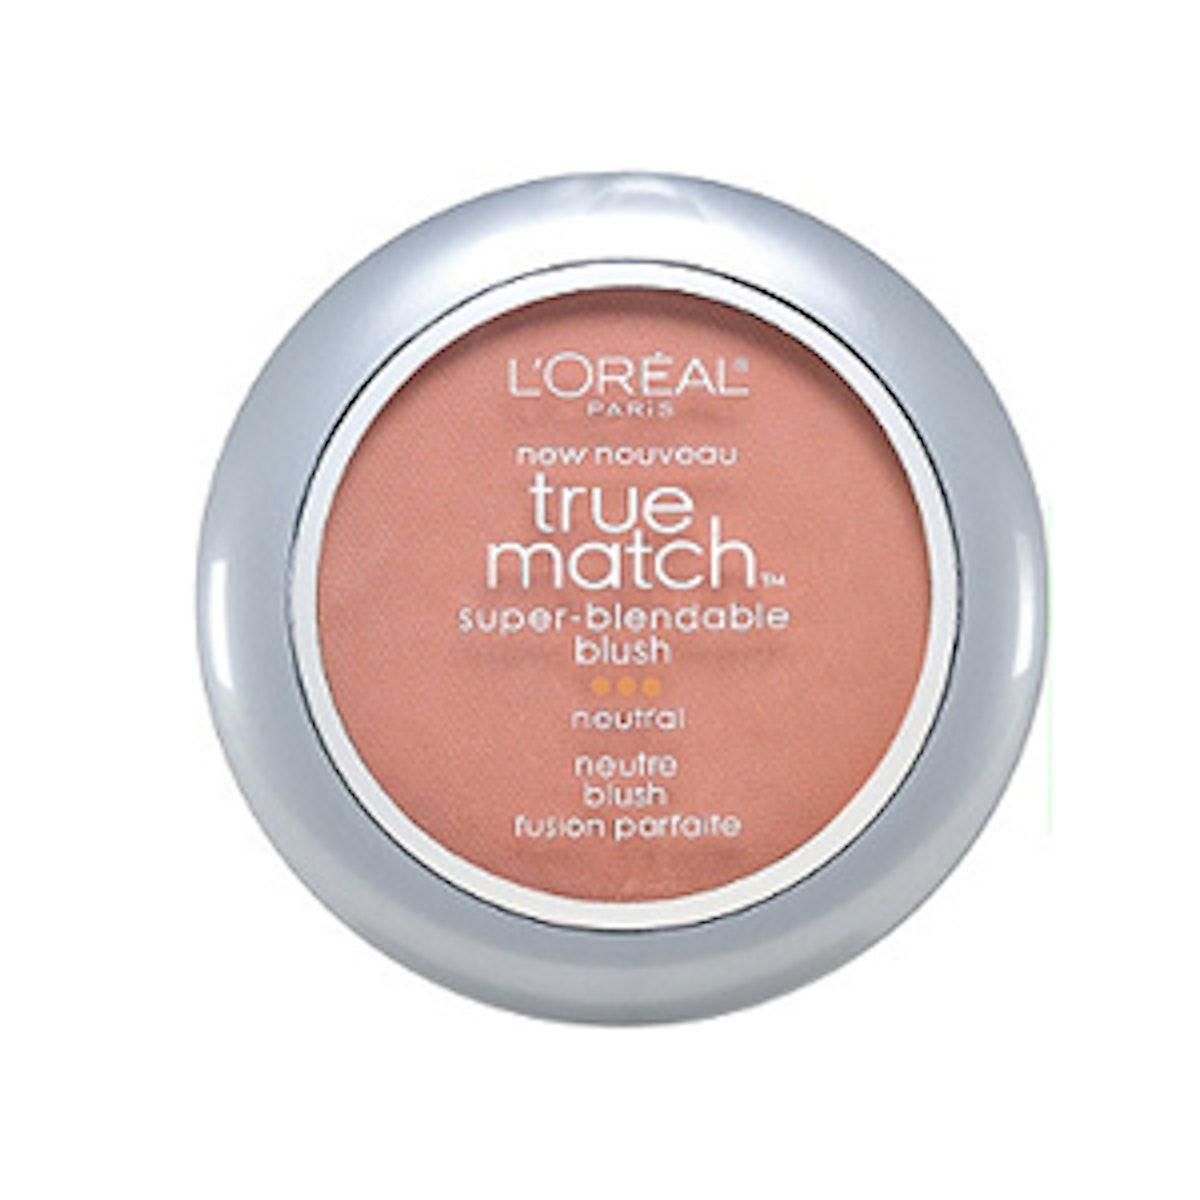 True Match Super Blendable Blush in Apricot Kiss